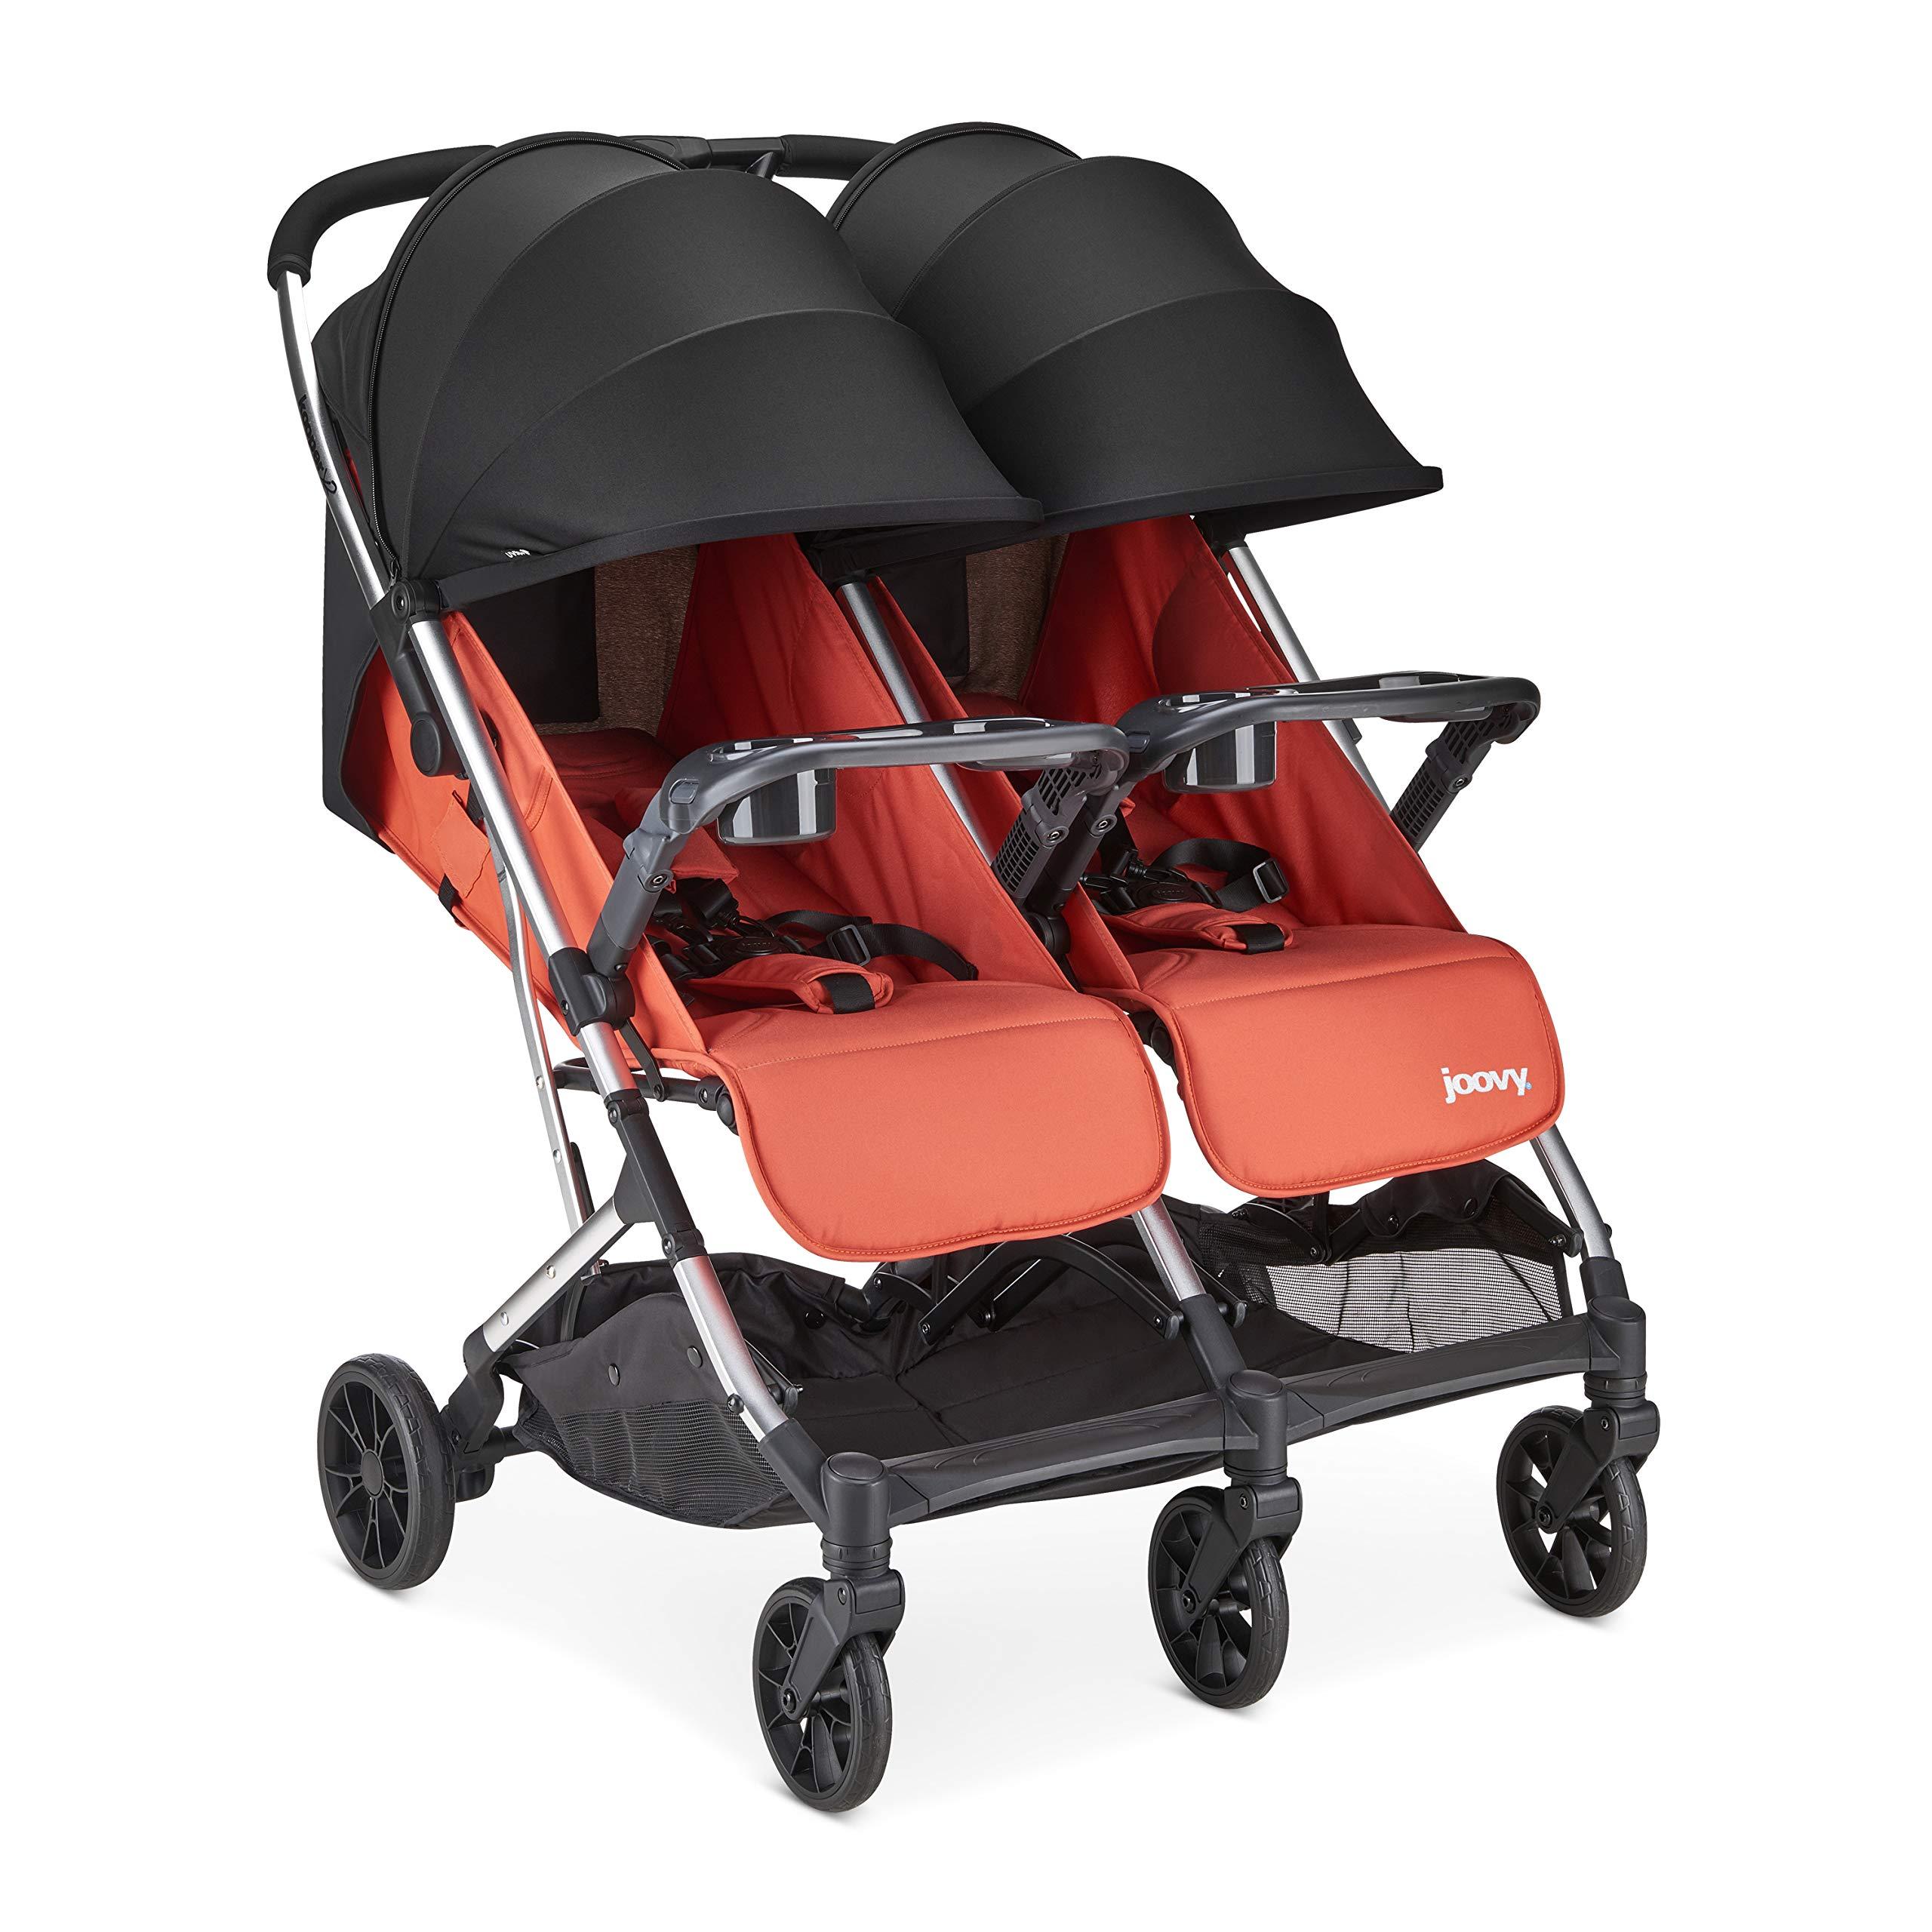 Joovy 8225 Kooper X2 Stroller, Paprika